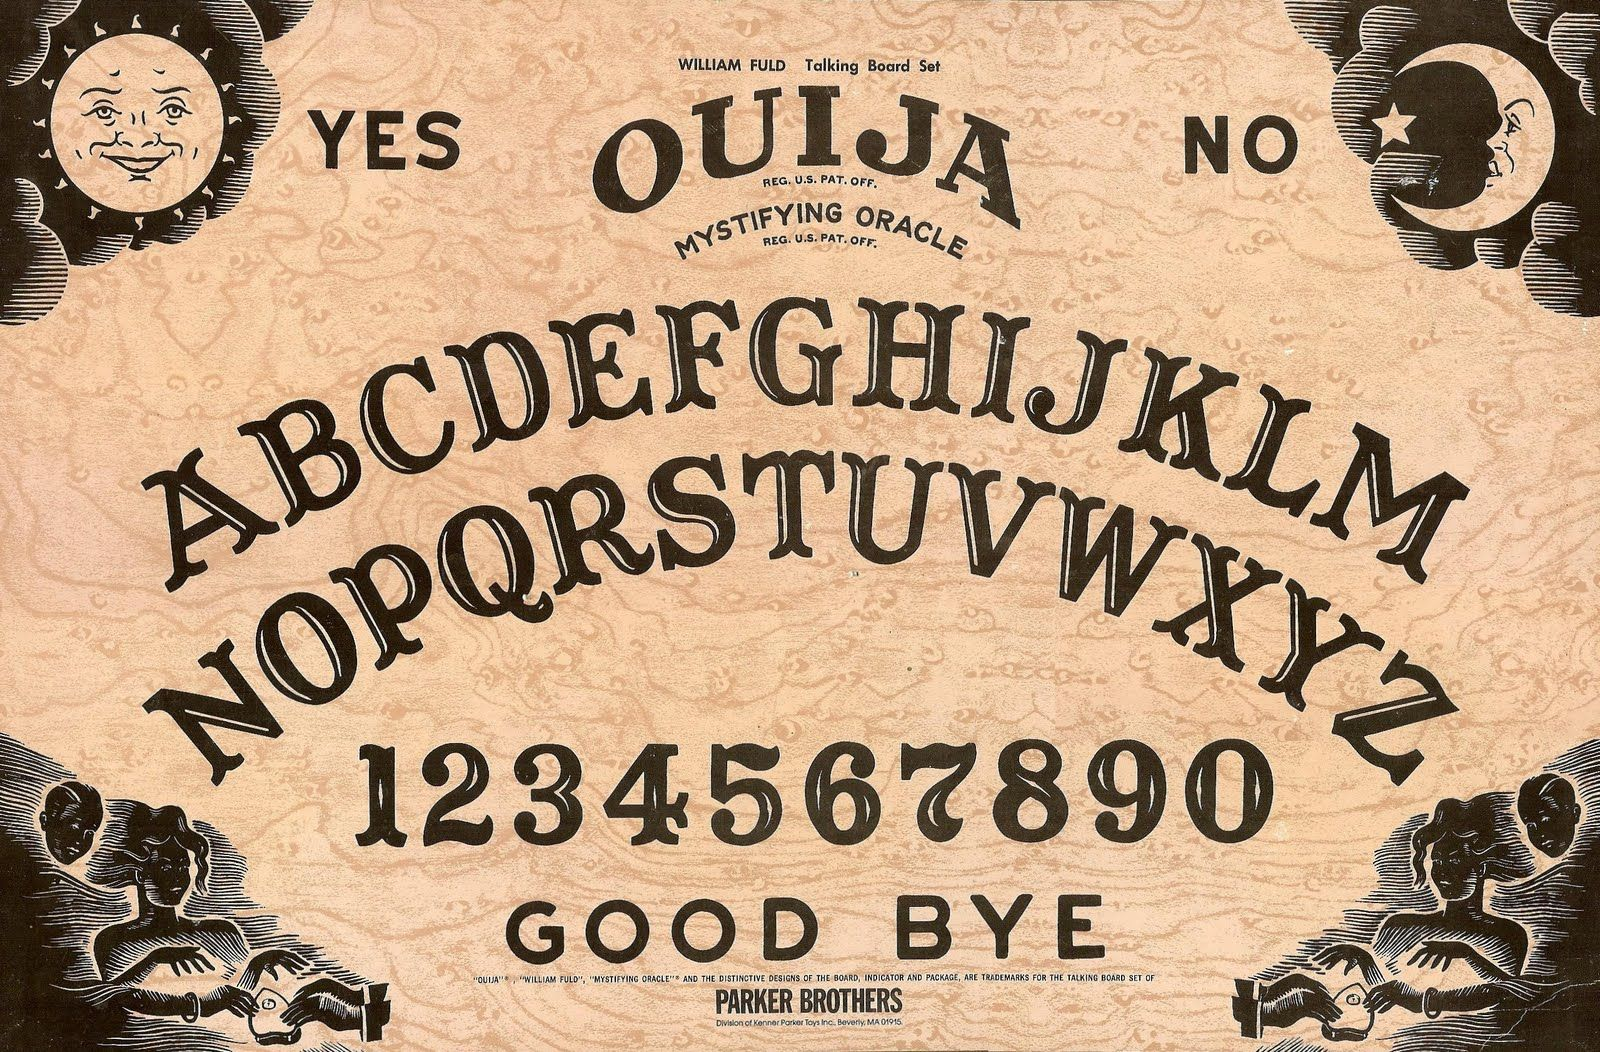 image regarding Printable Ouija Board called Ouija Board Hasbro Great Hinge Wallet Retro 1960s Ouija